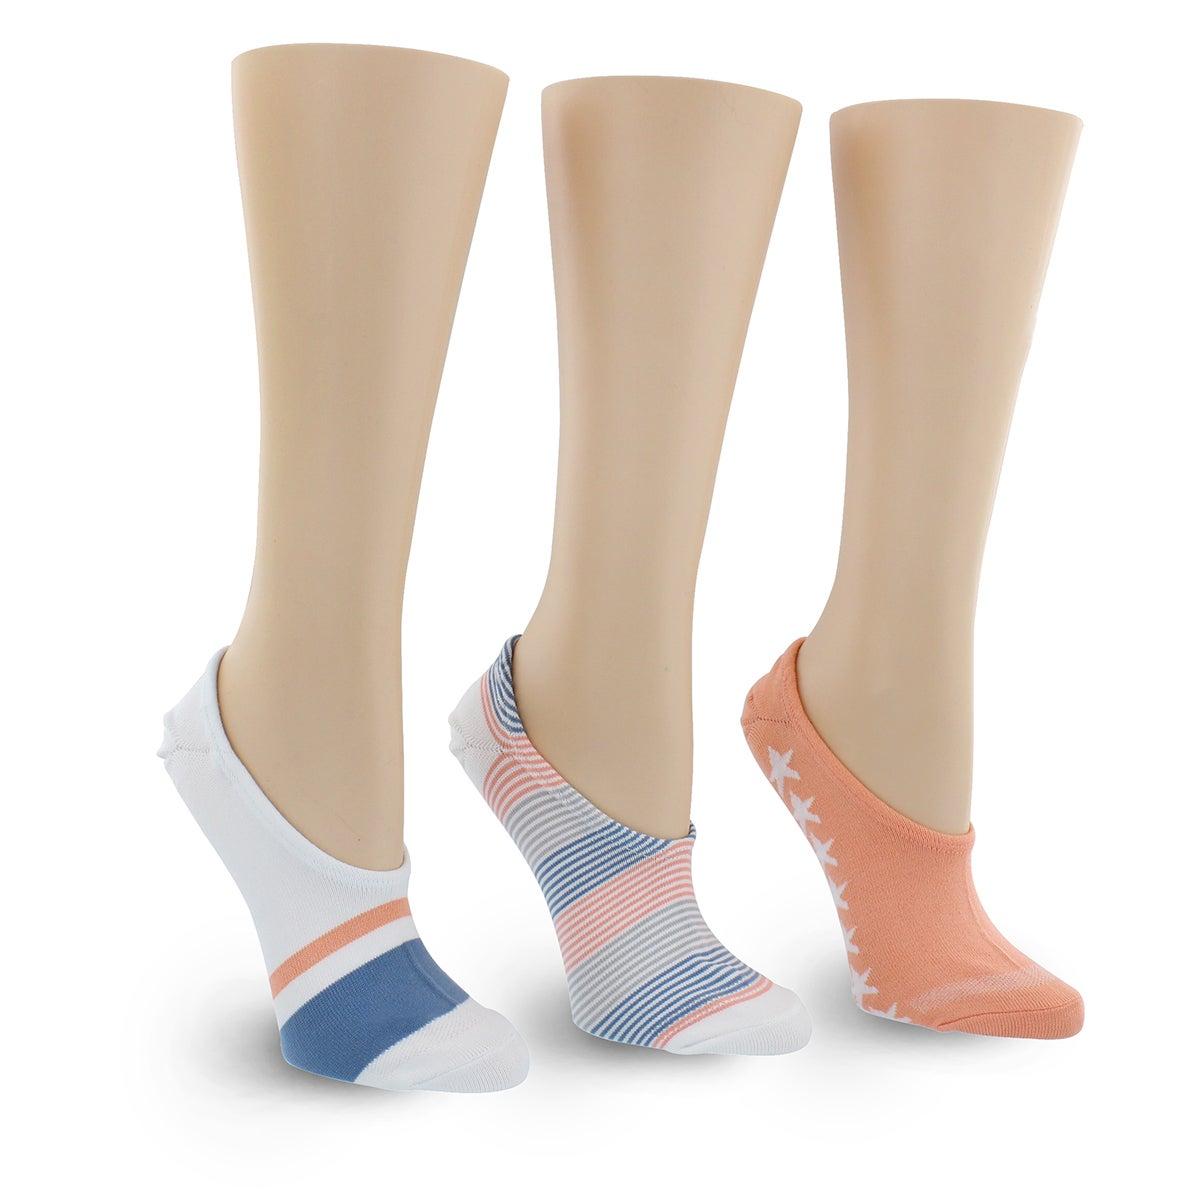 Lds Stahhs-N-Stripes multi sock - 3 pak